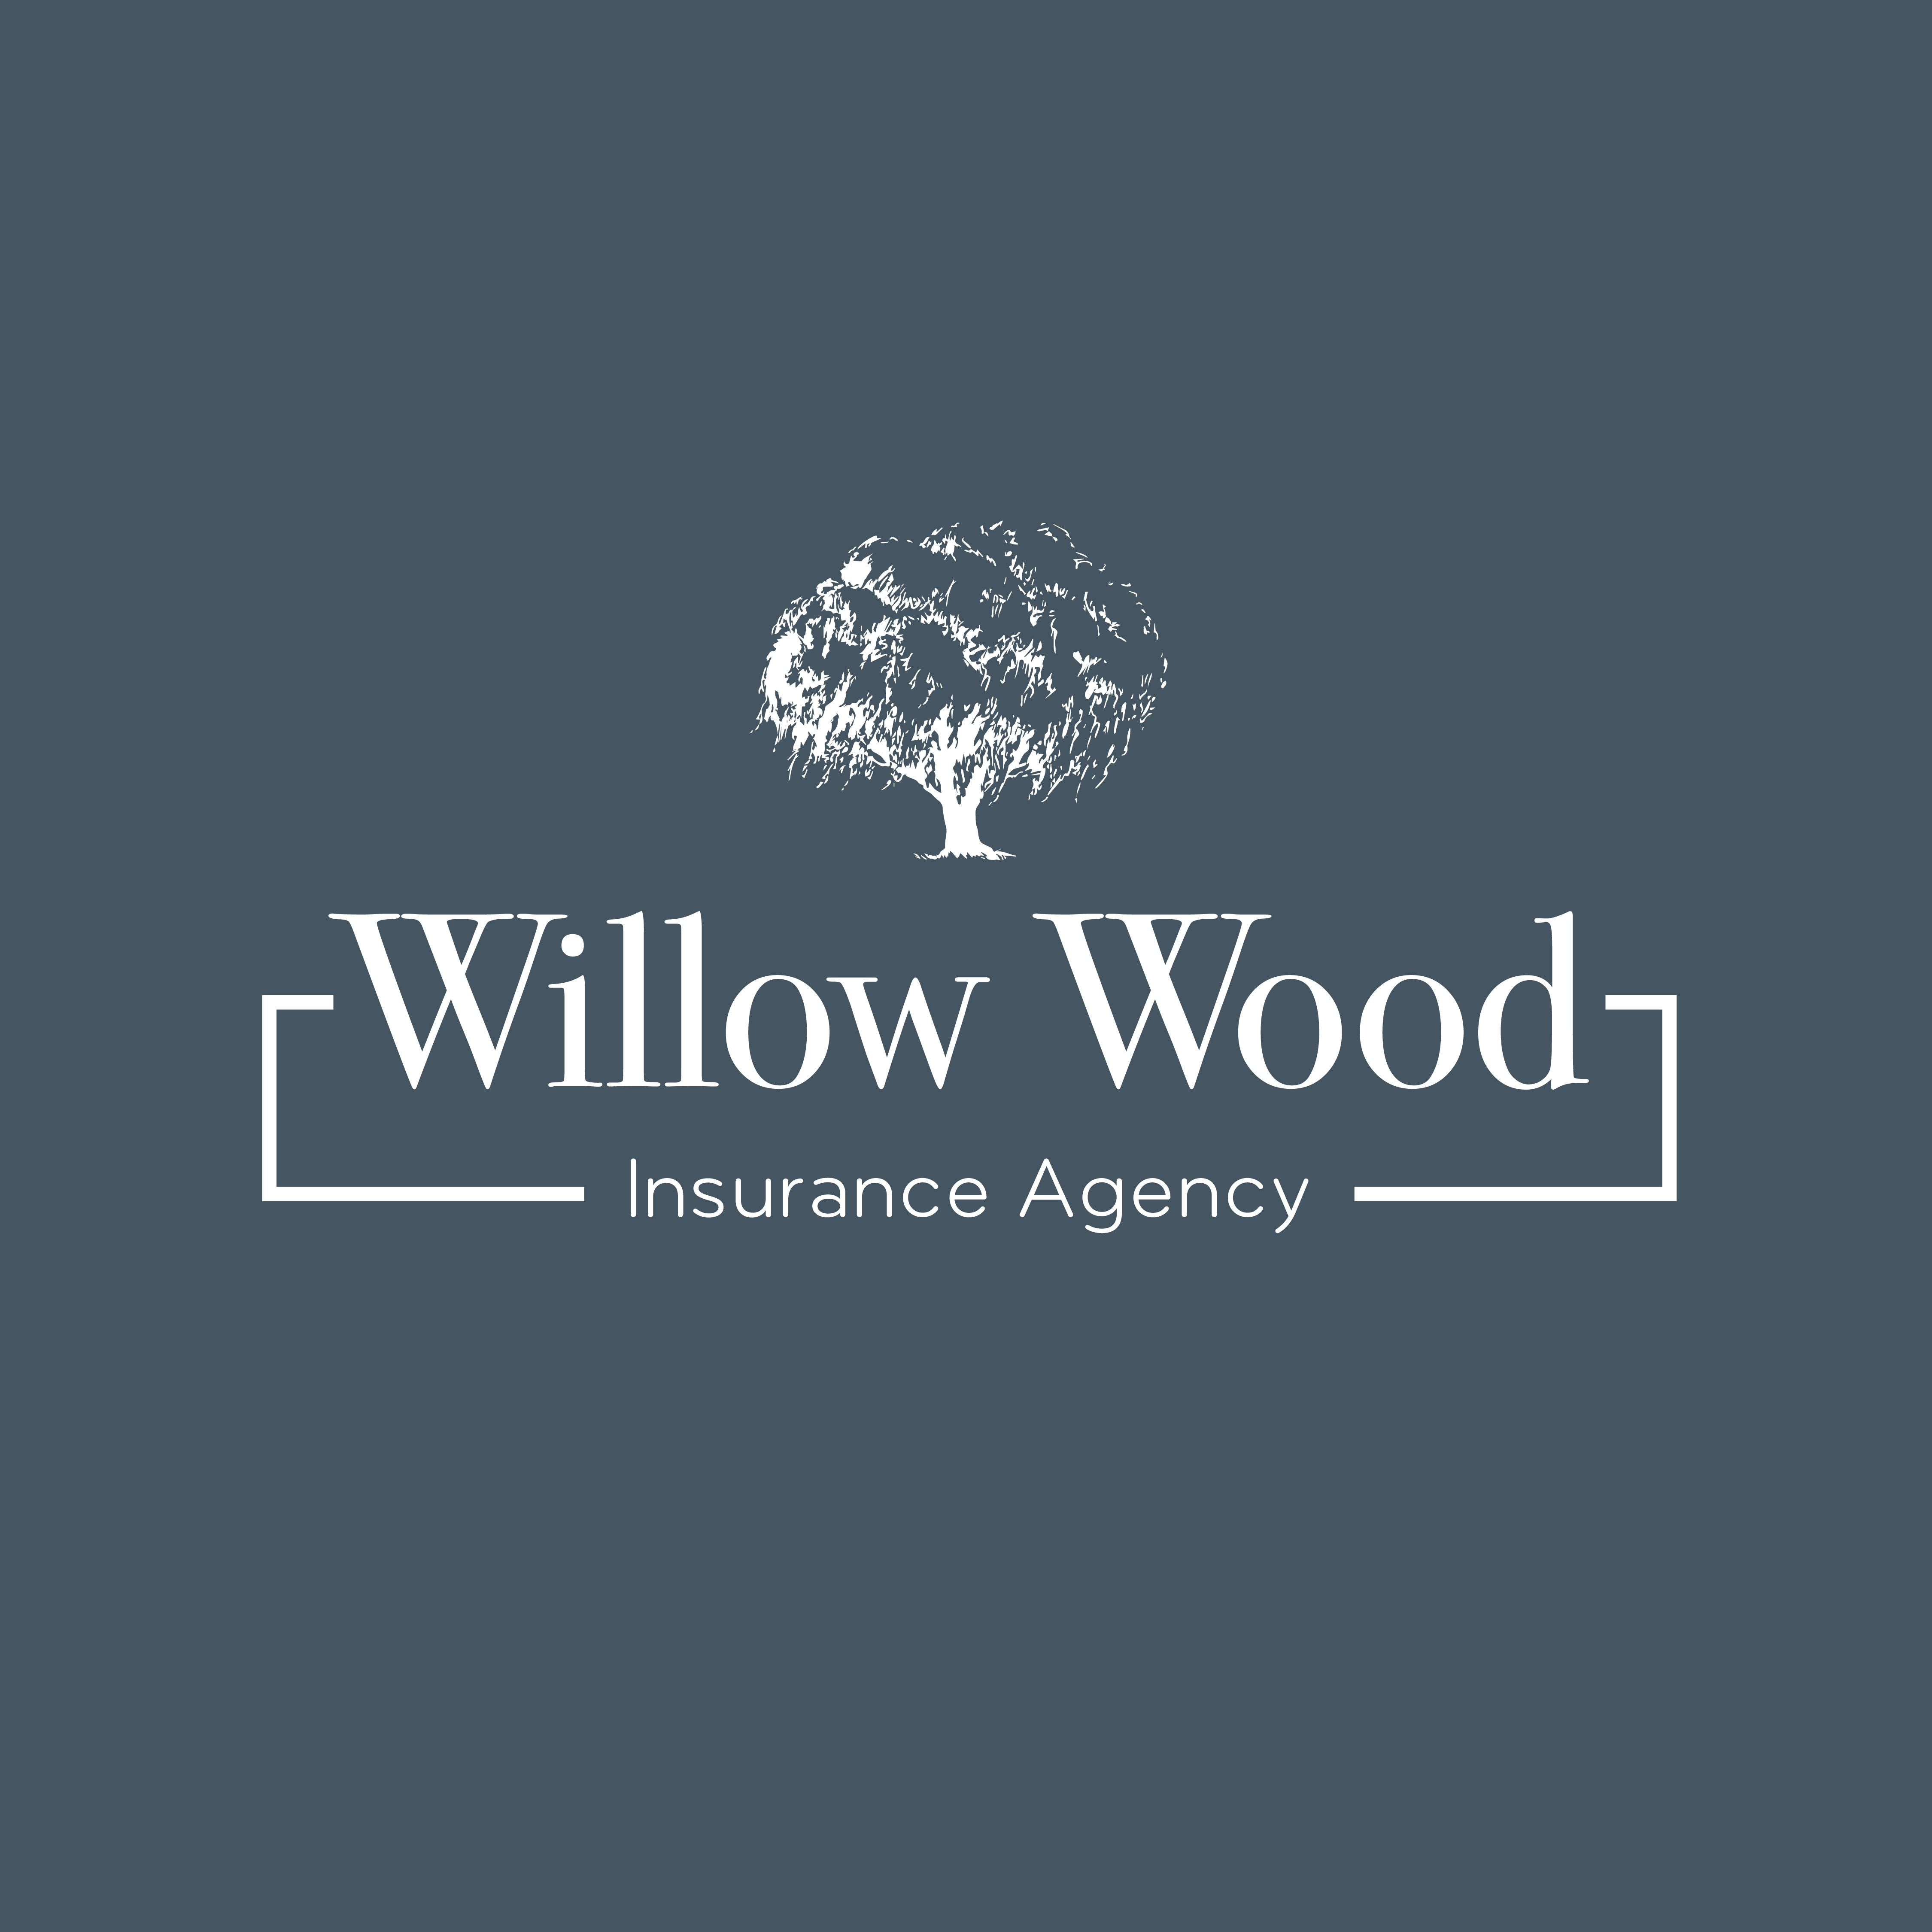 Willow Wood Insurance in 2020 Willow wood, Insurance